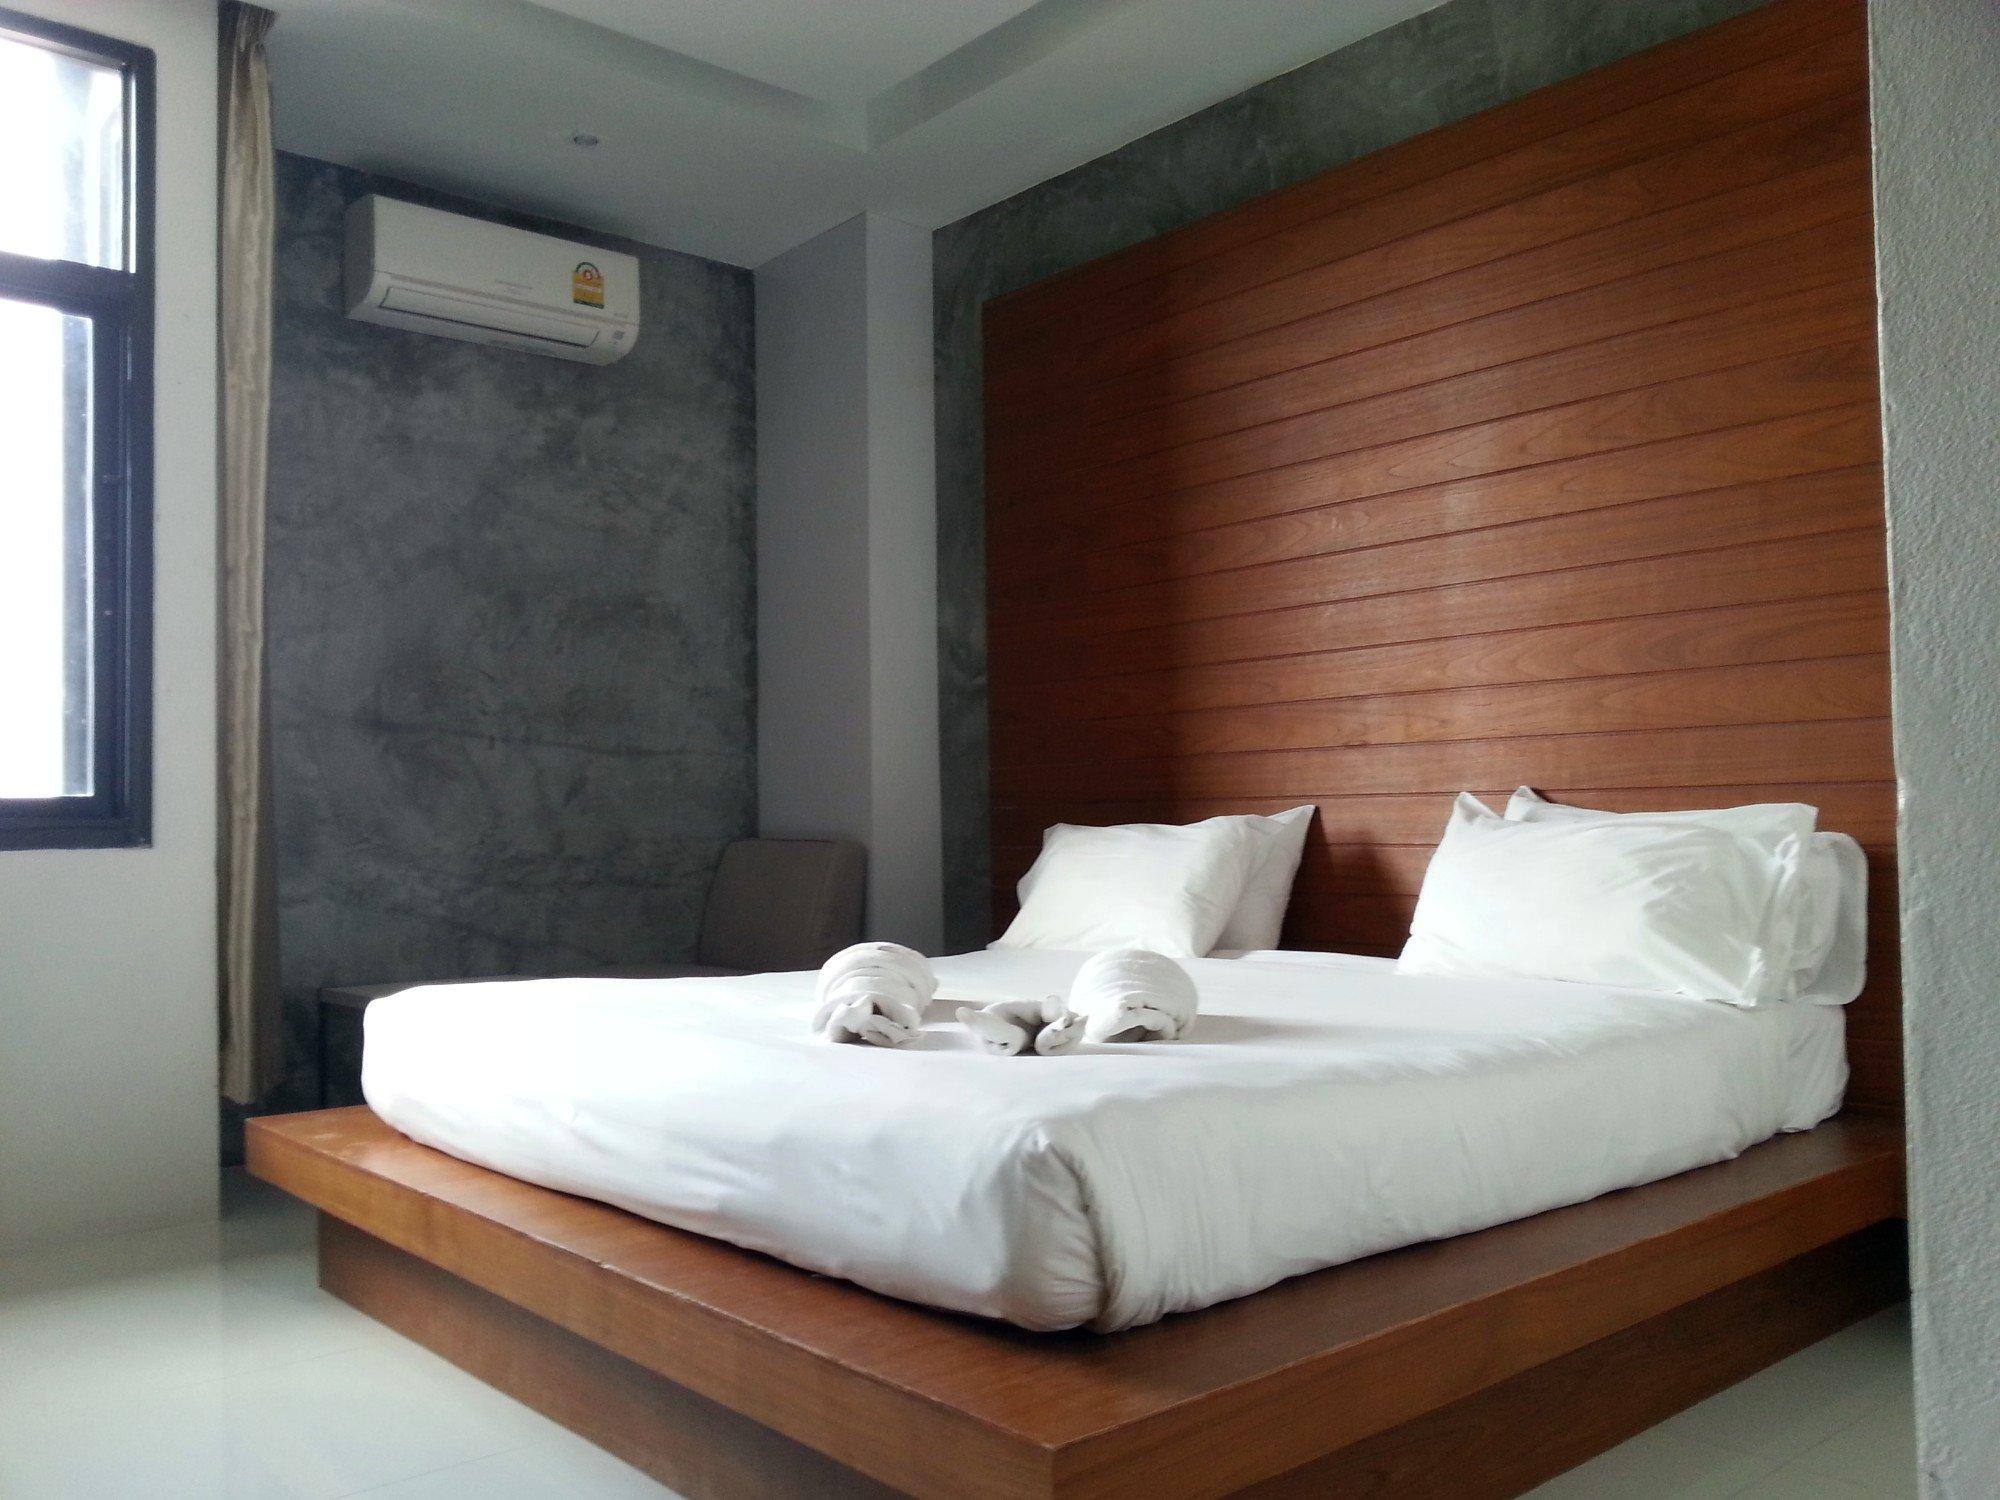 Bedroom at the Merdelong Hotel